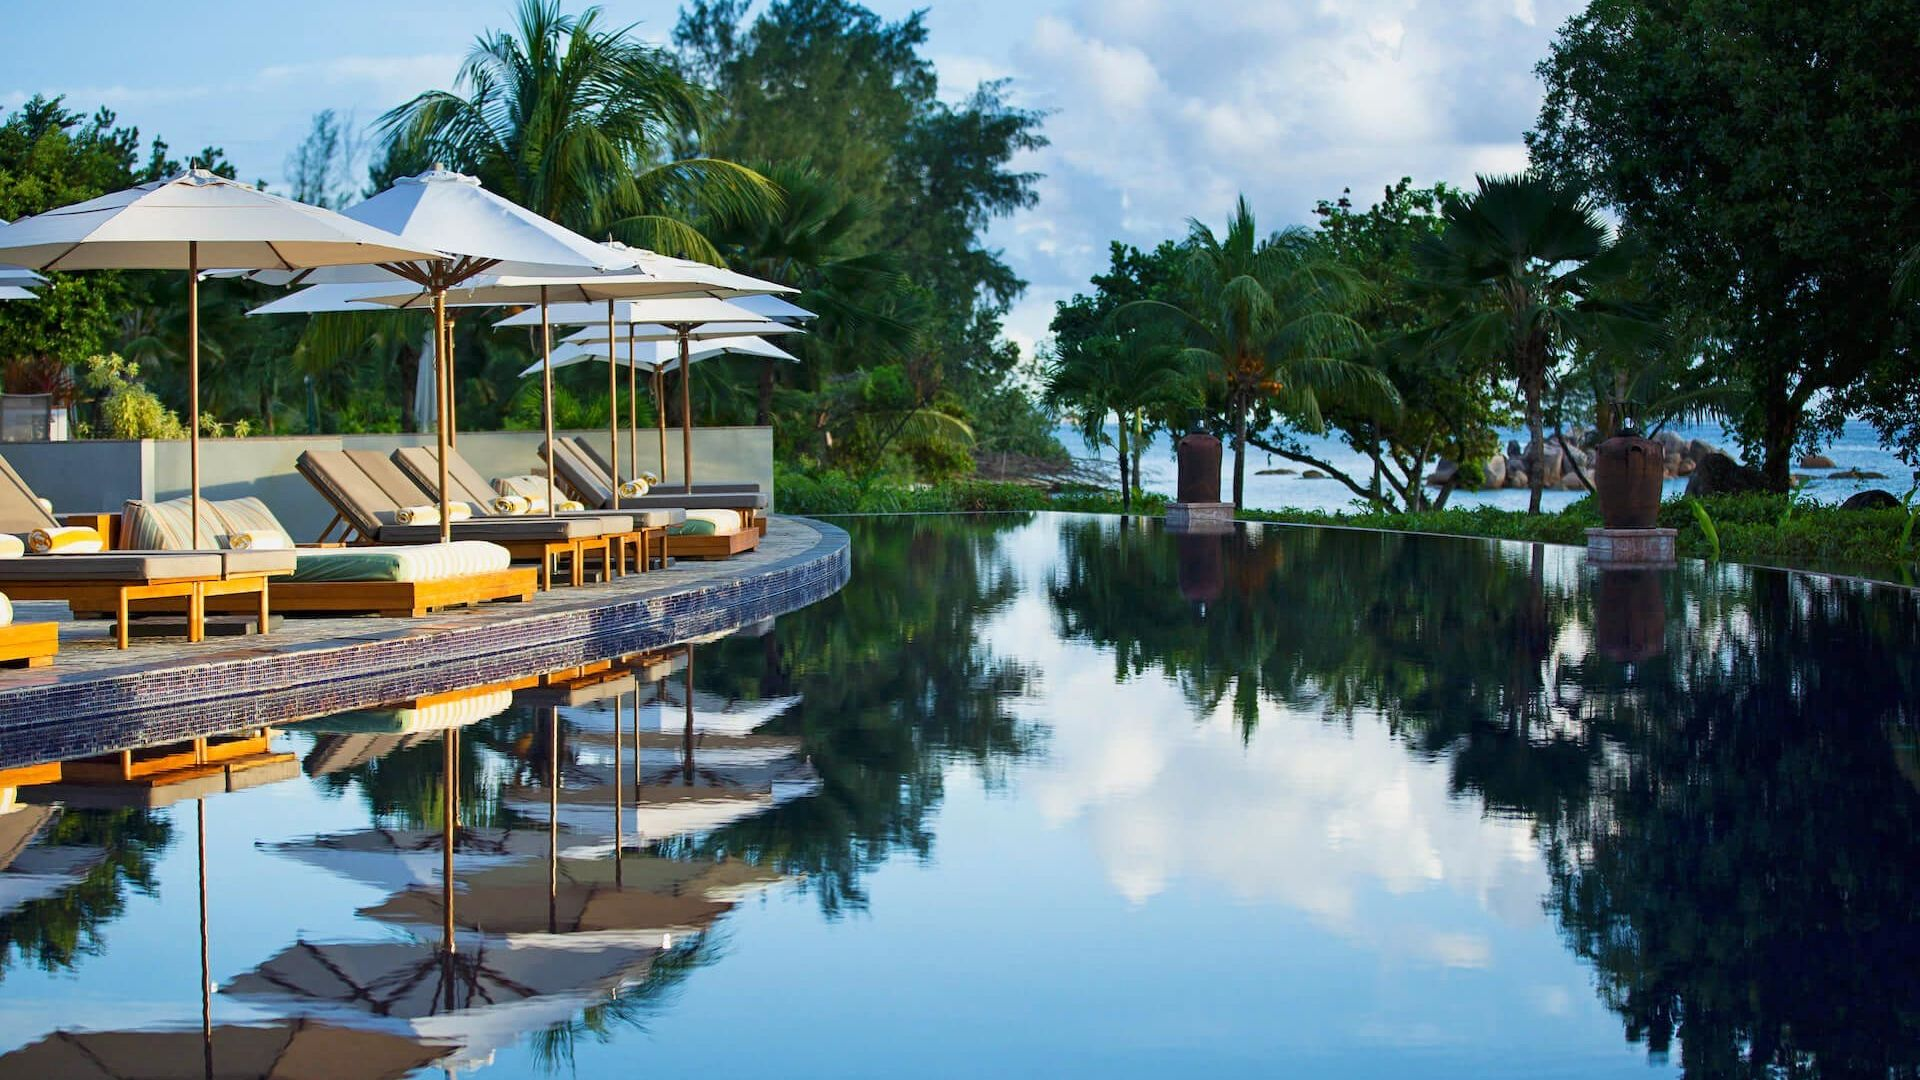 Craciun 2021 - Sejur charter Raffles, Insula Praslin, Seychelles - 9 zile